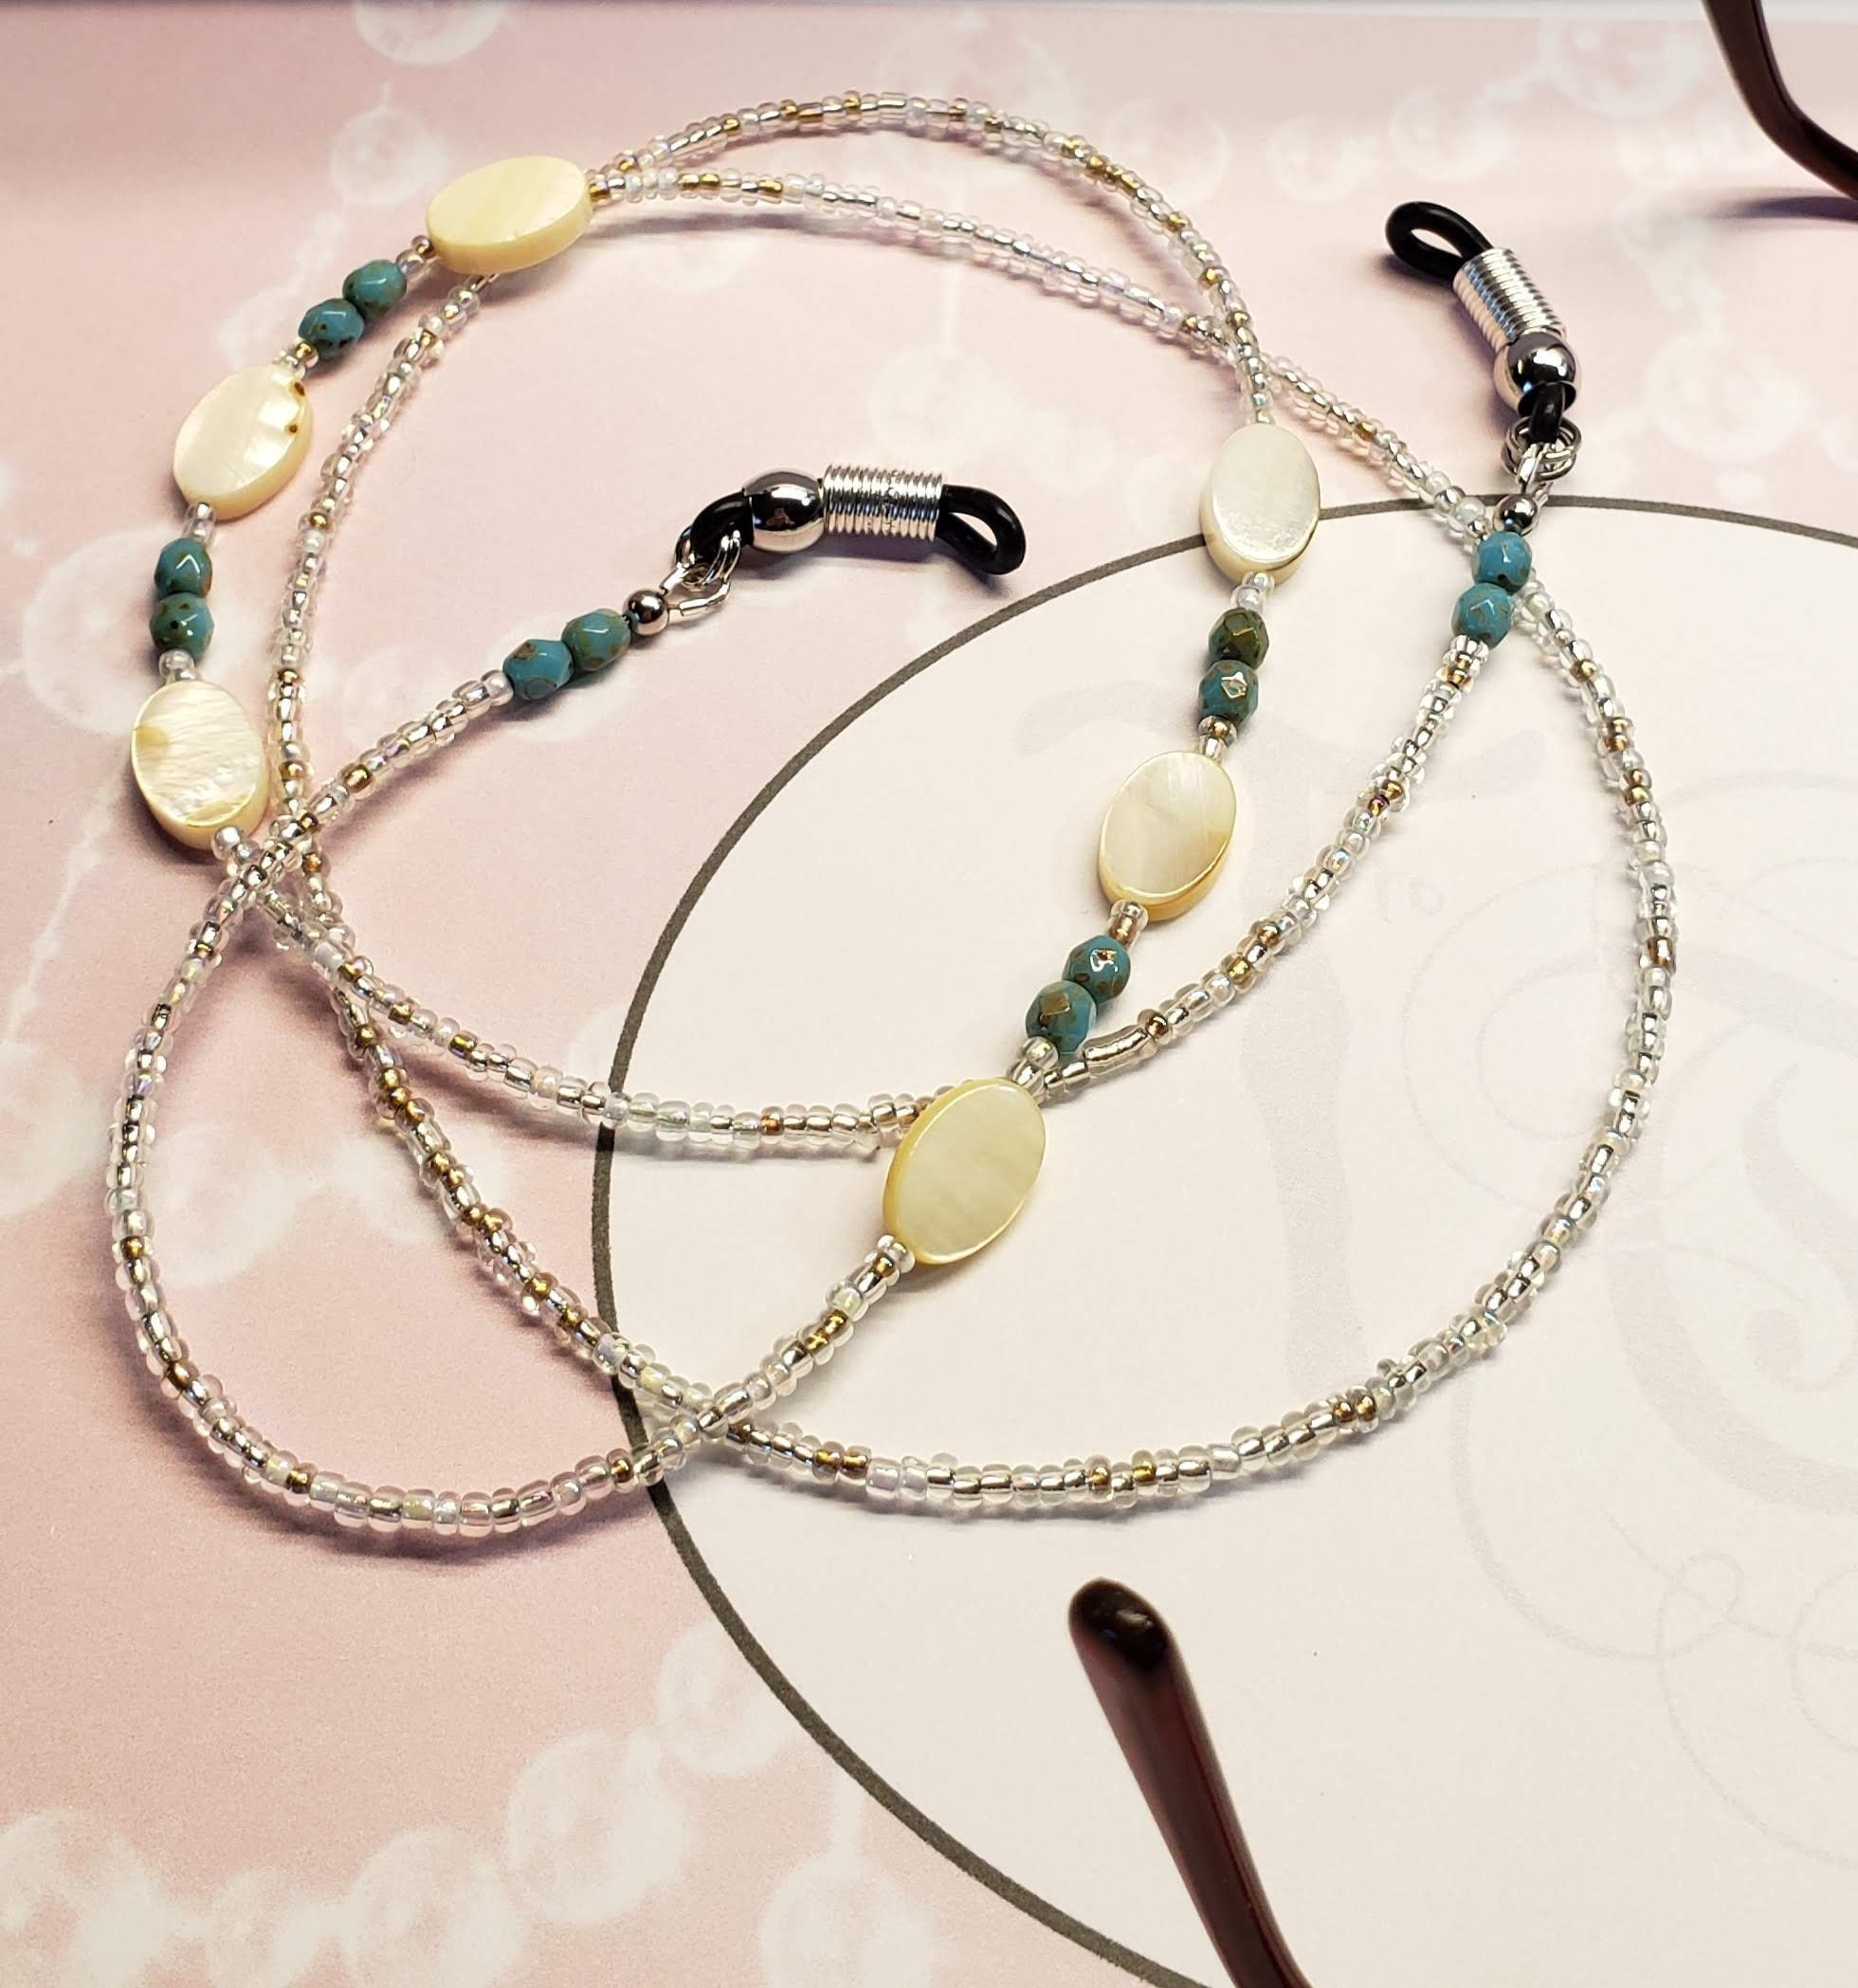 4f5d7a05c098 Glasses Lanyard Eyewear Fashion Accessory Eyeglass Chain Eyewear Accessory  Lanyards Eyeglass Holder Customizable Lanyard Mother of Pearl